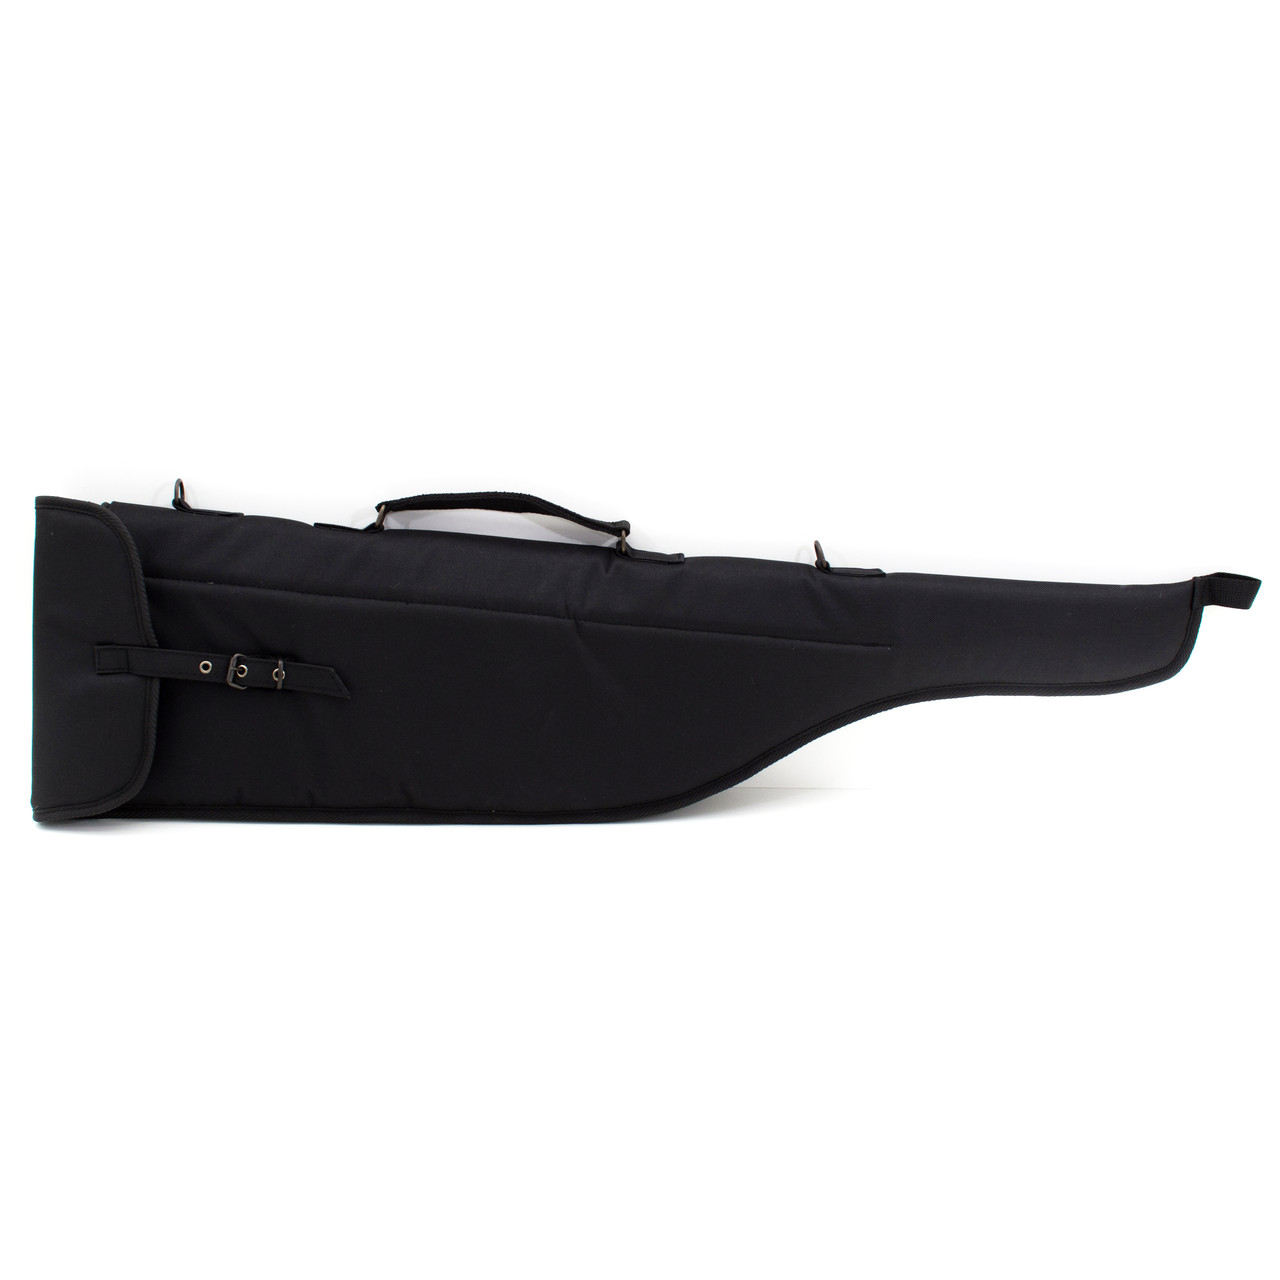 Чехол для ружья на паралоне черный 5207